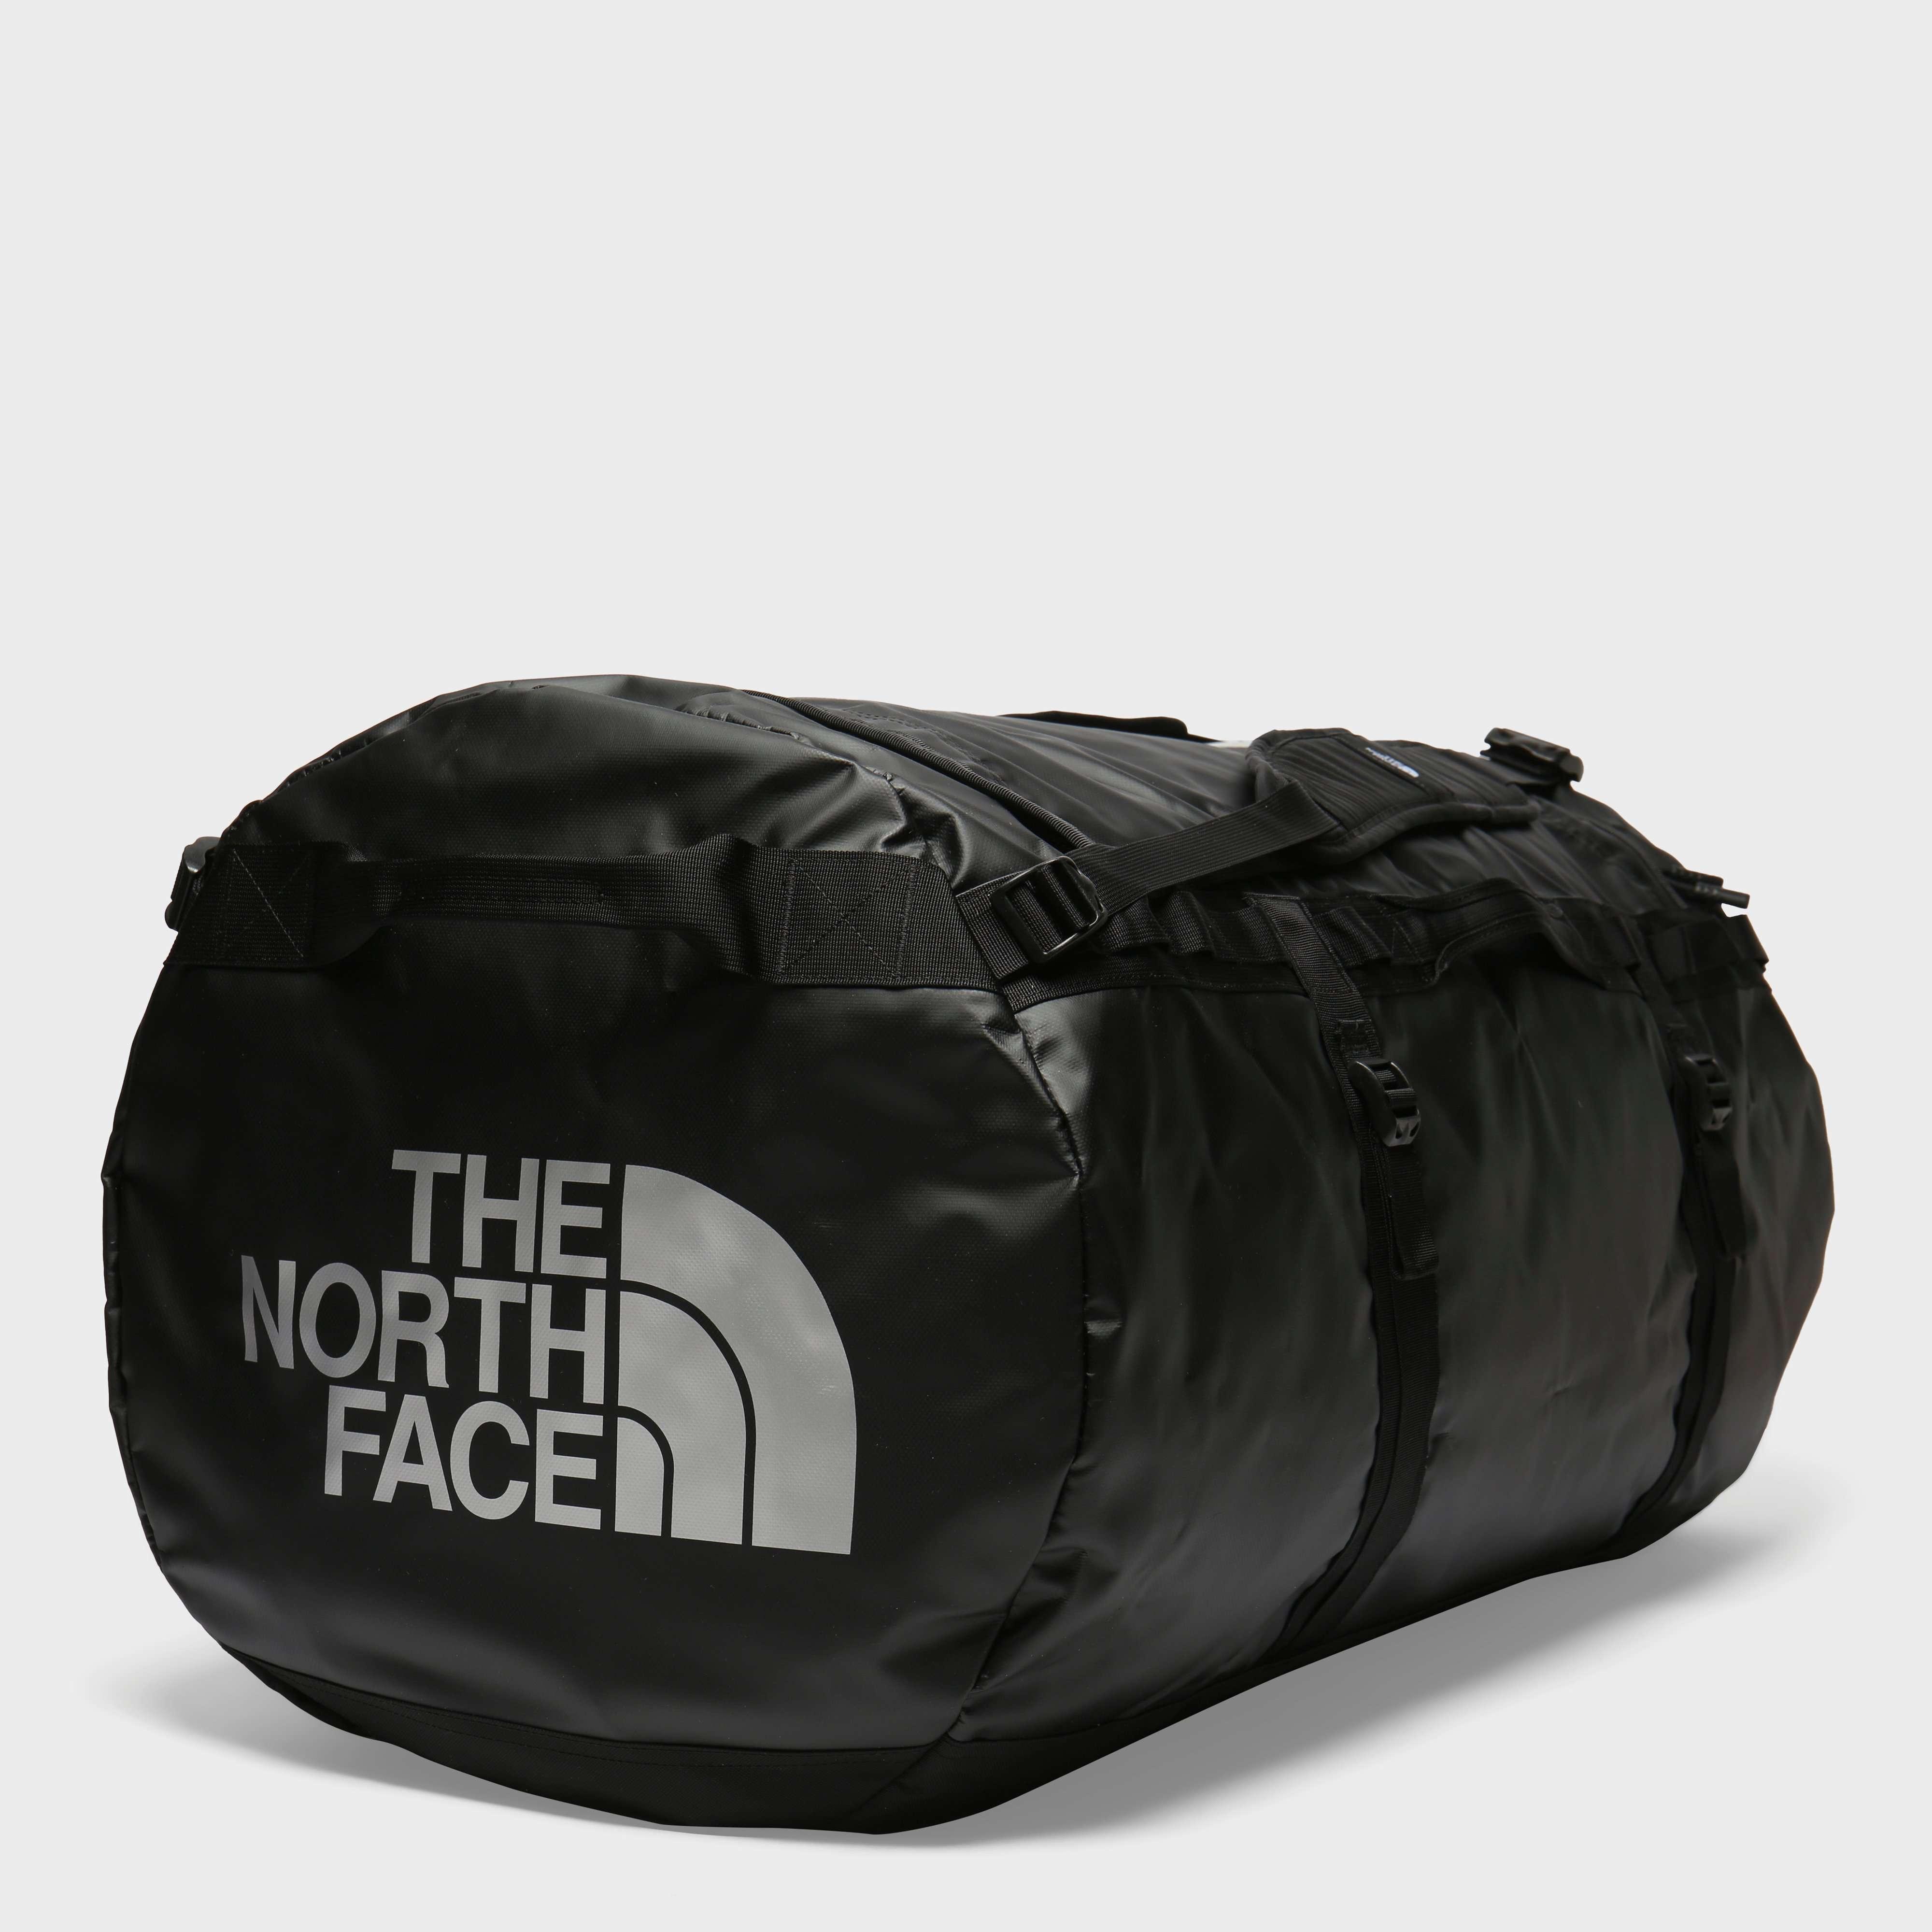 THE NORTH FACE Basecamp Duffel Bag (XXL)